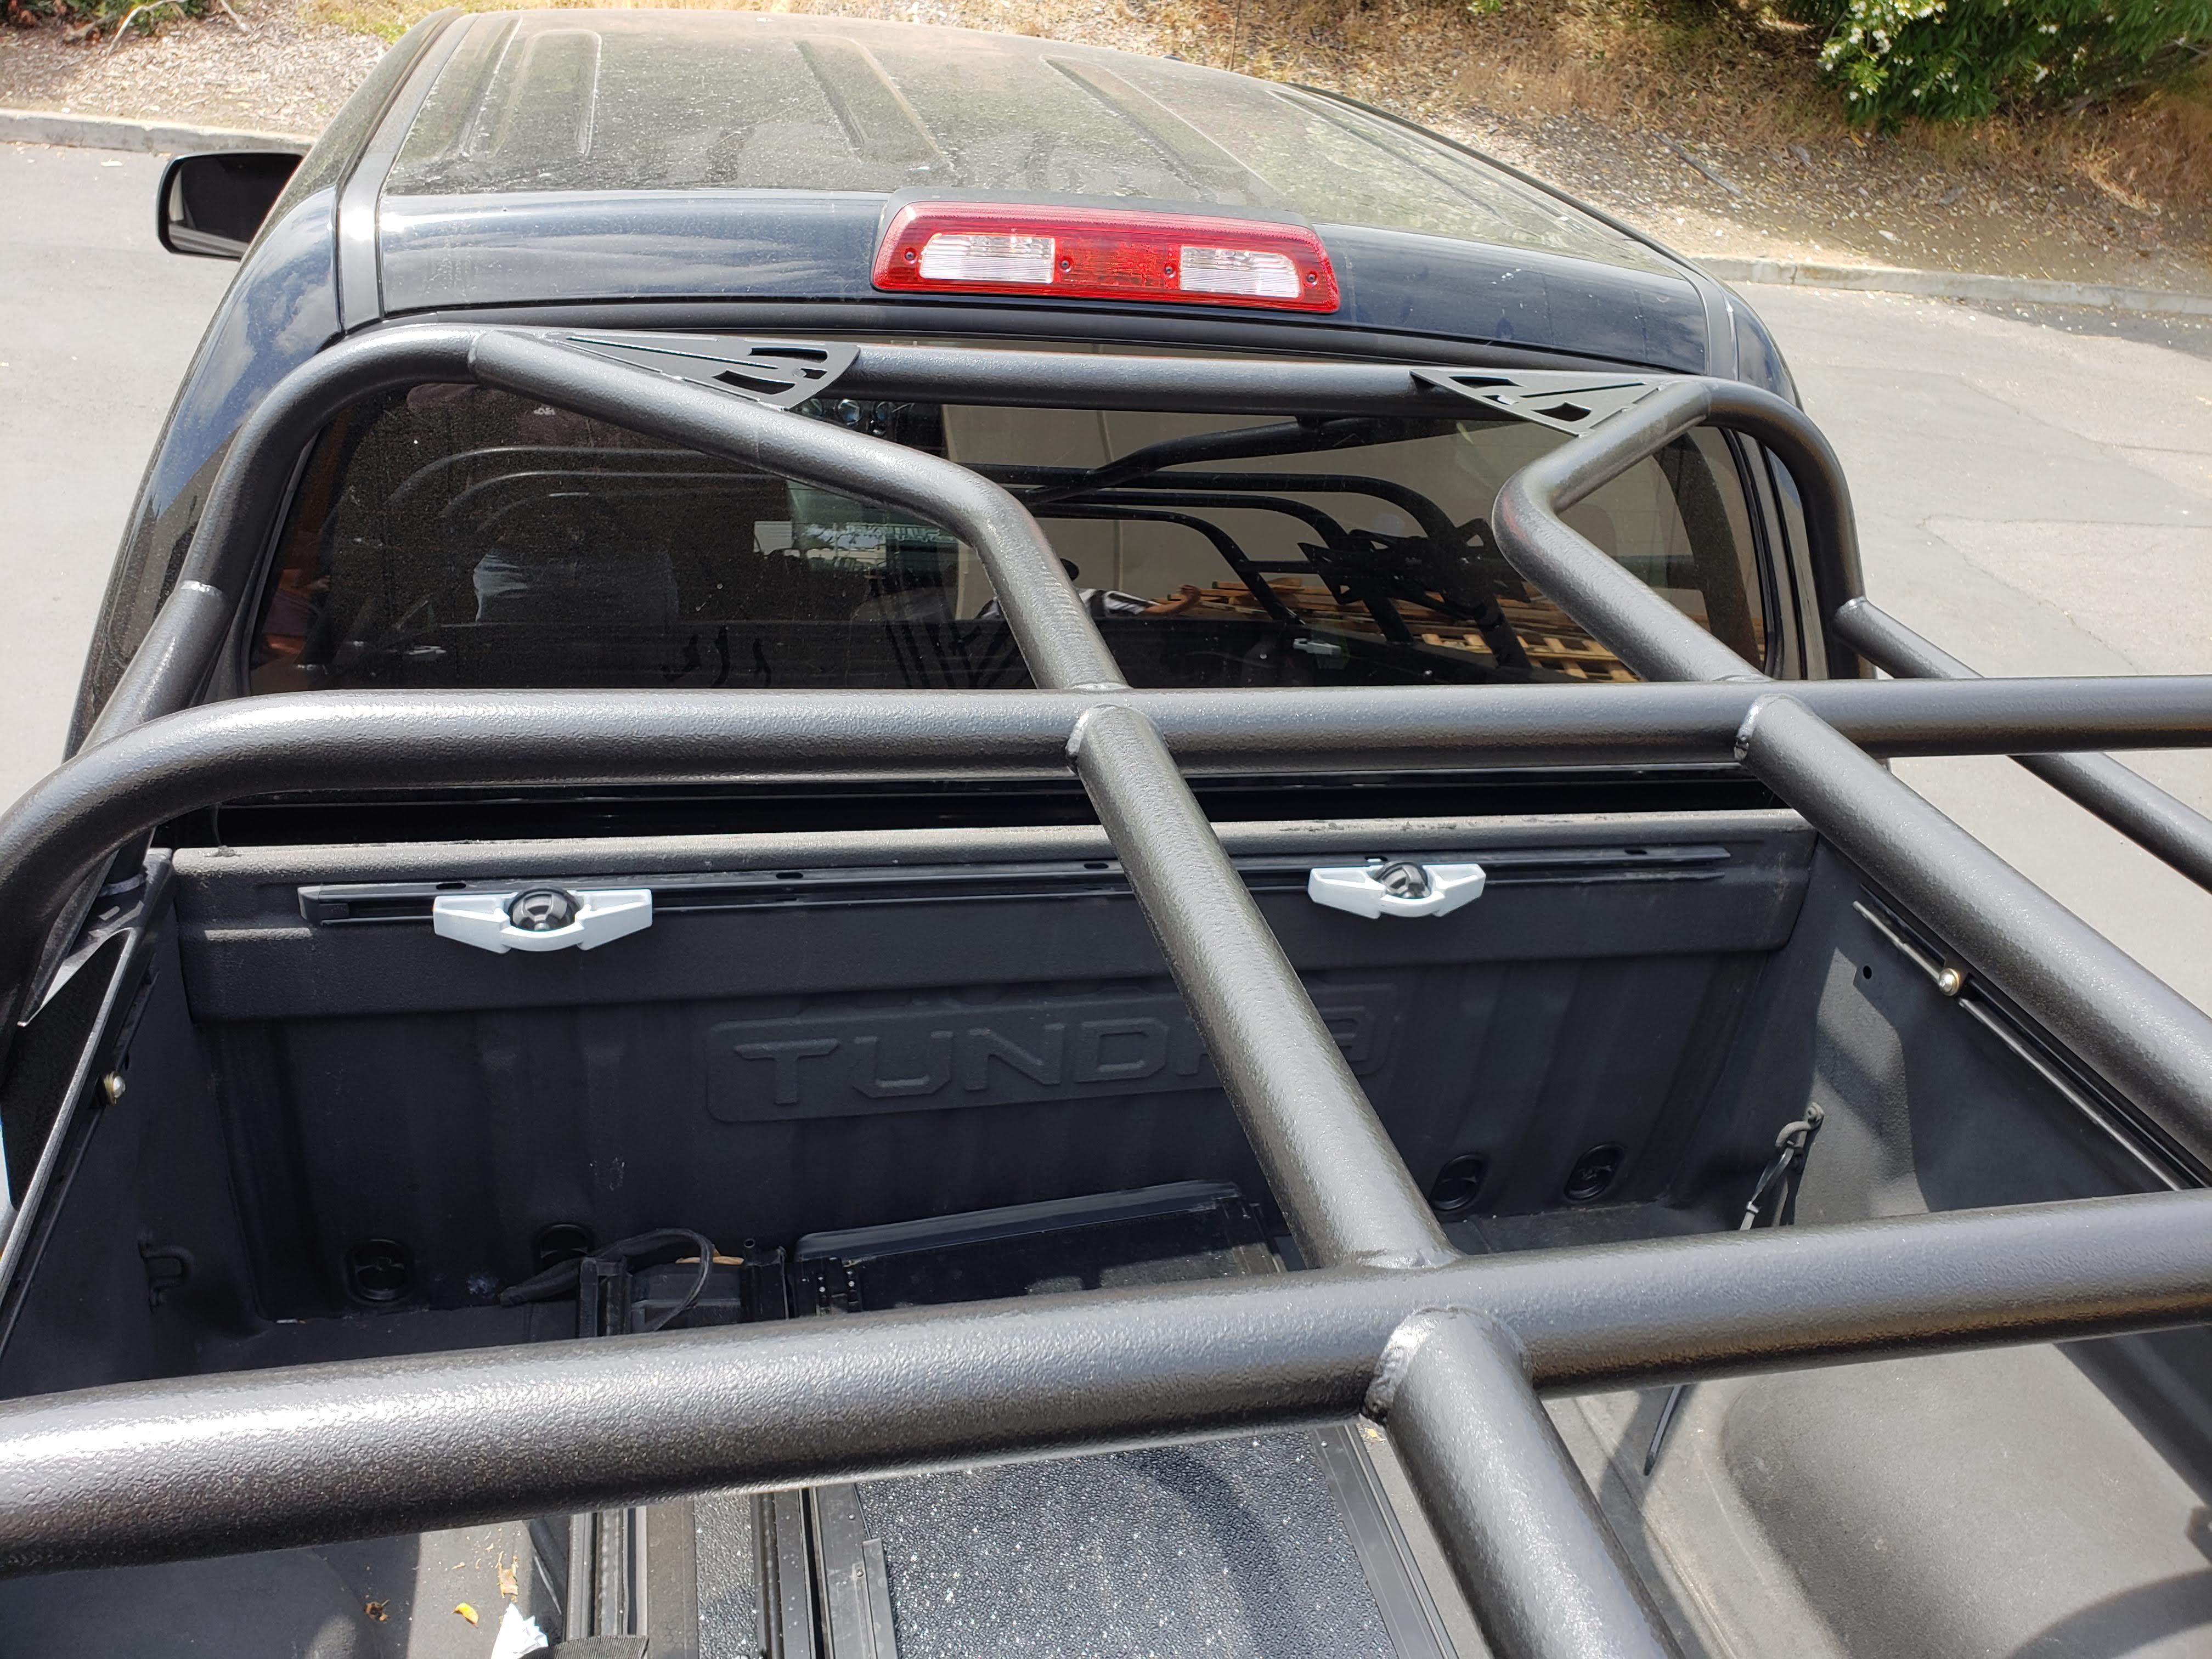 2007 2021 Toyota Tundra Bed Rack